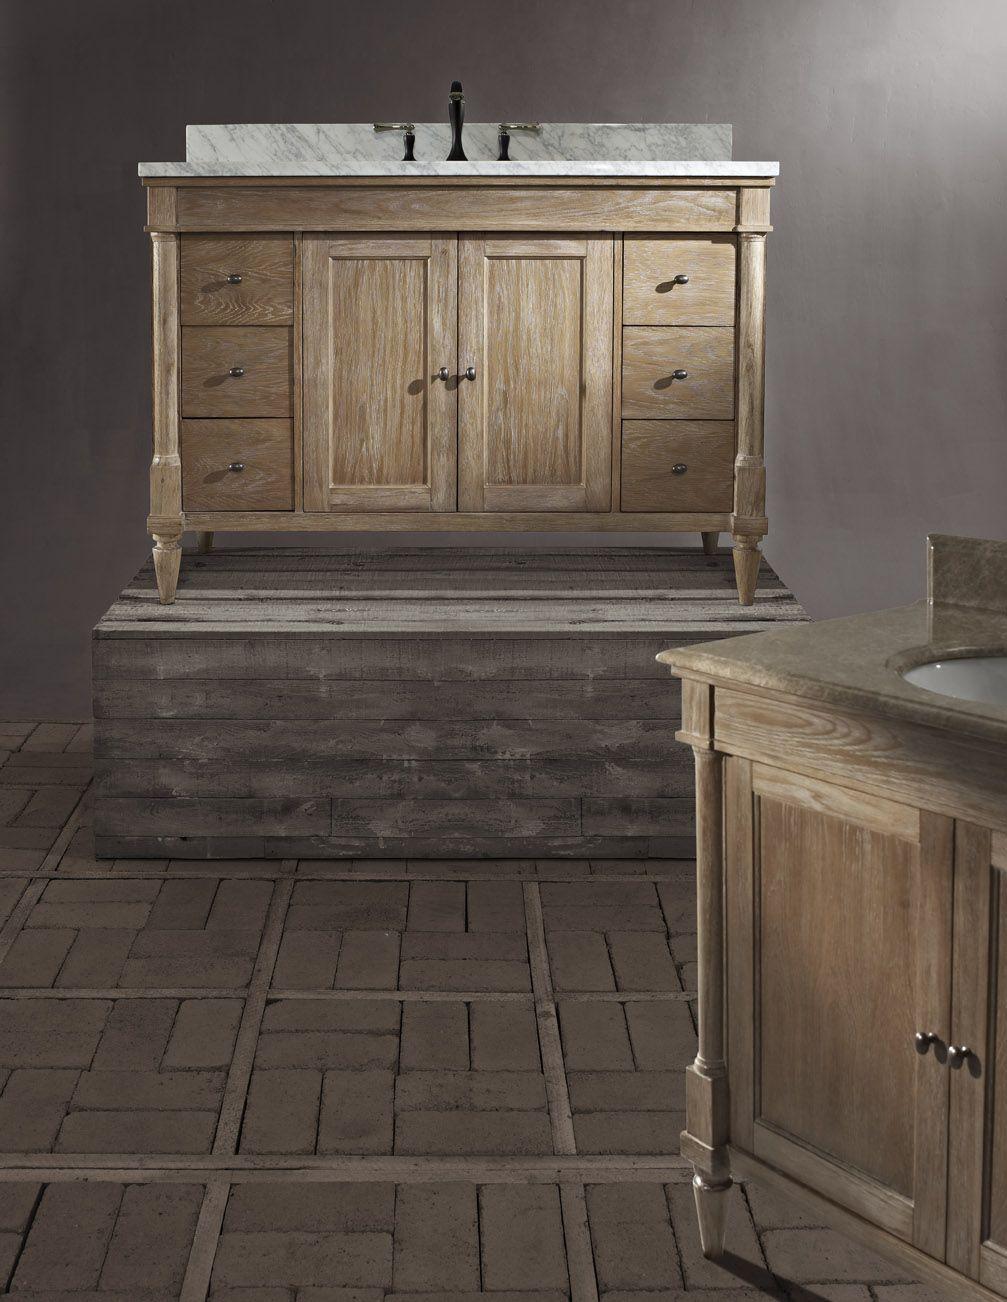 Fairmont designs rustic chic collection bathroom remodel pinterest rustic chic bath and Fairmont designs bathroom vanity cottage